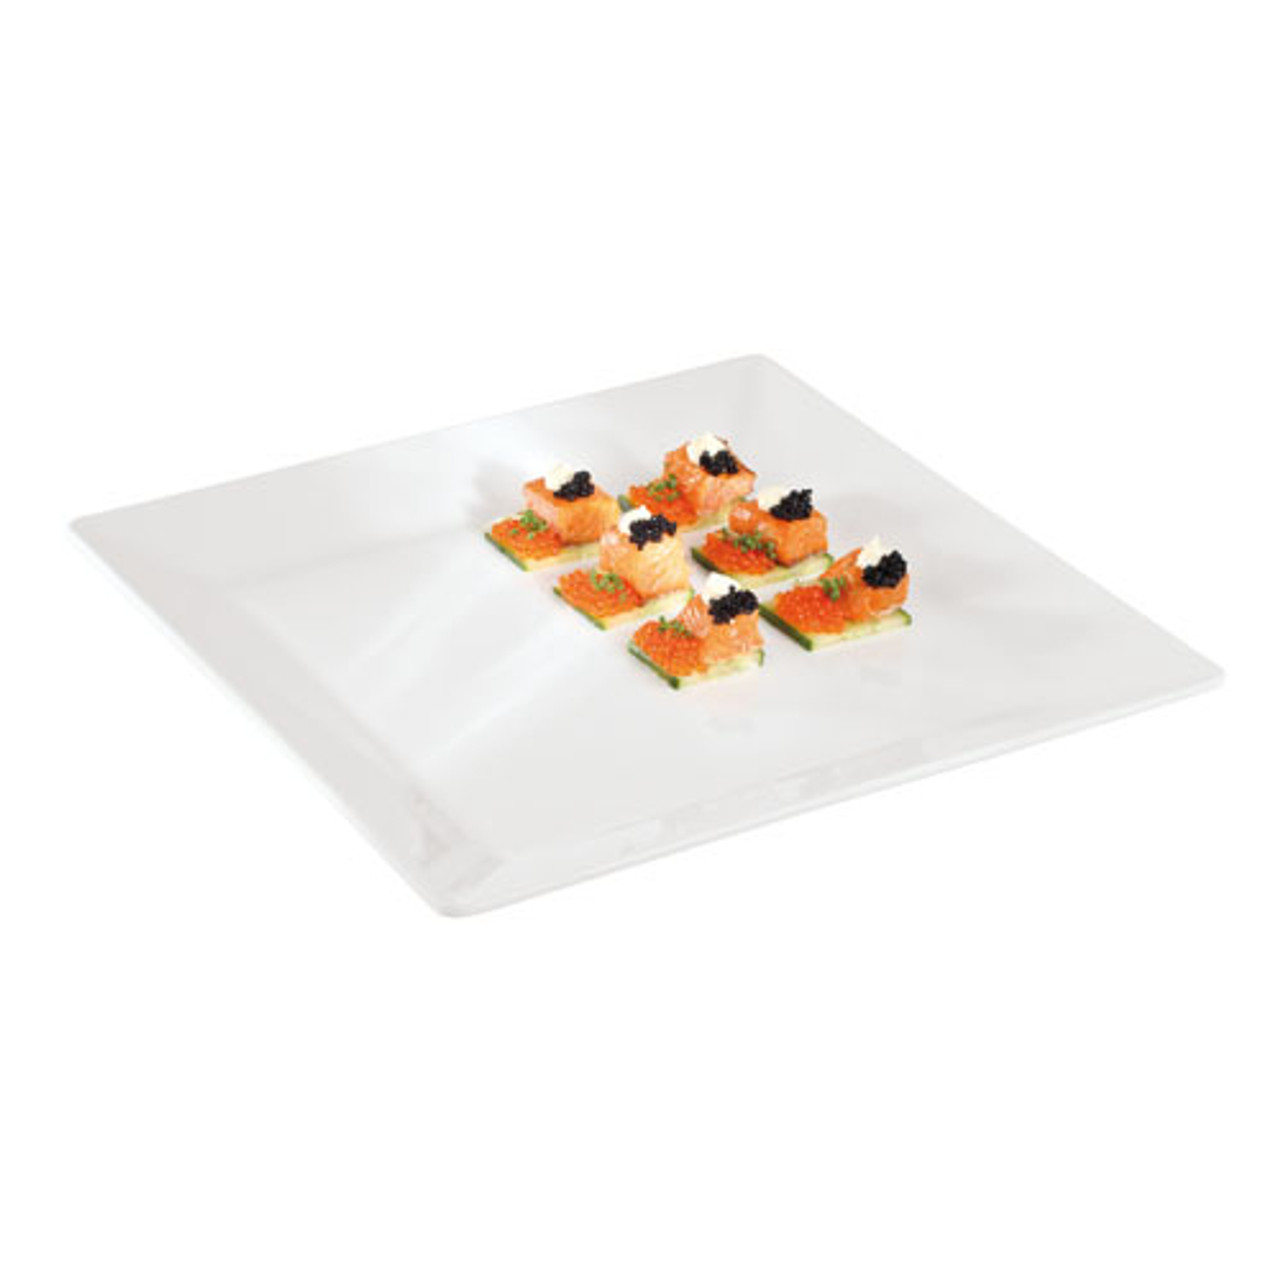 20 1/8 Square White Melamine Platter, L 20.125 x W 20.125 x H 0.5